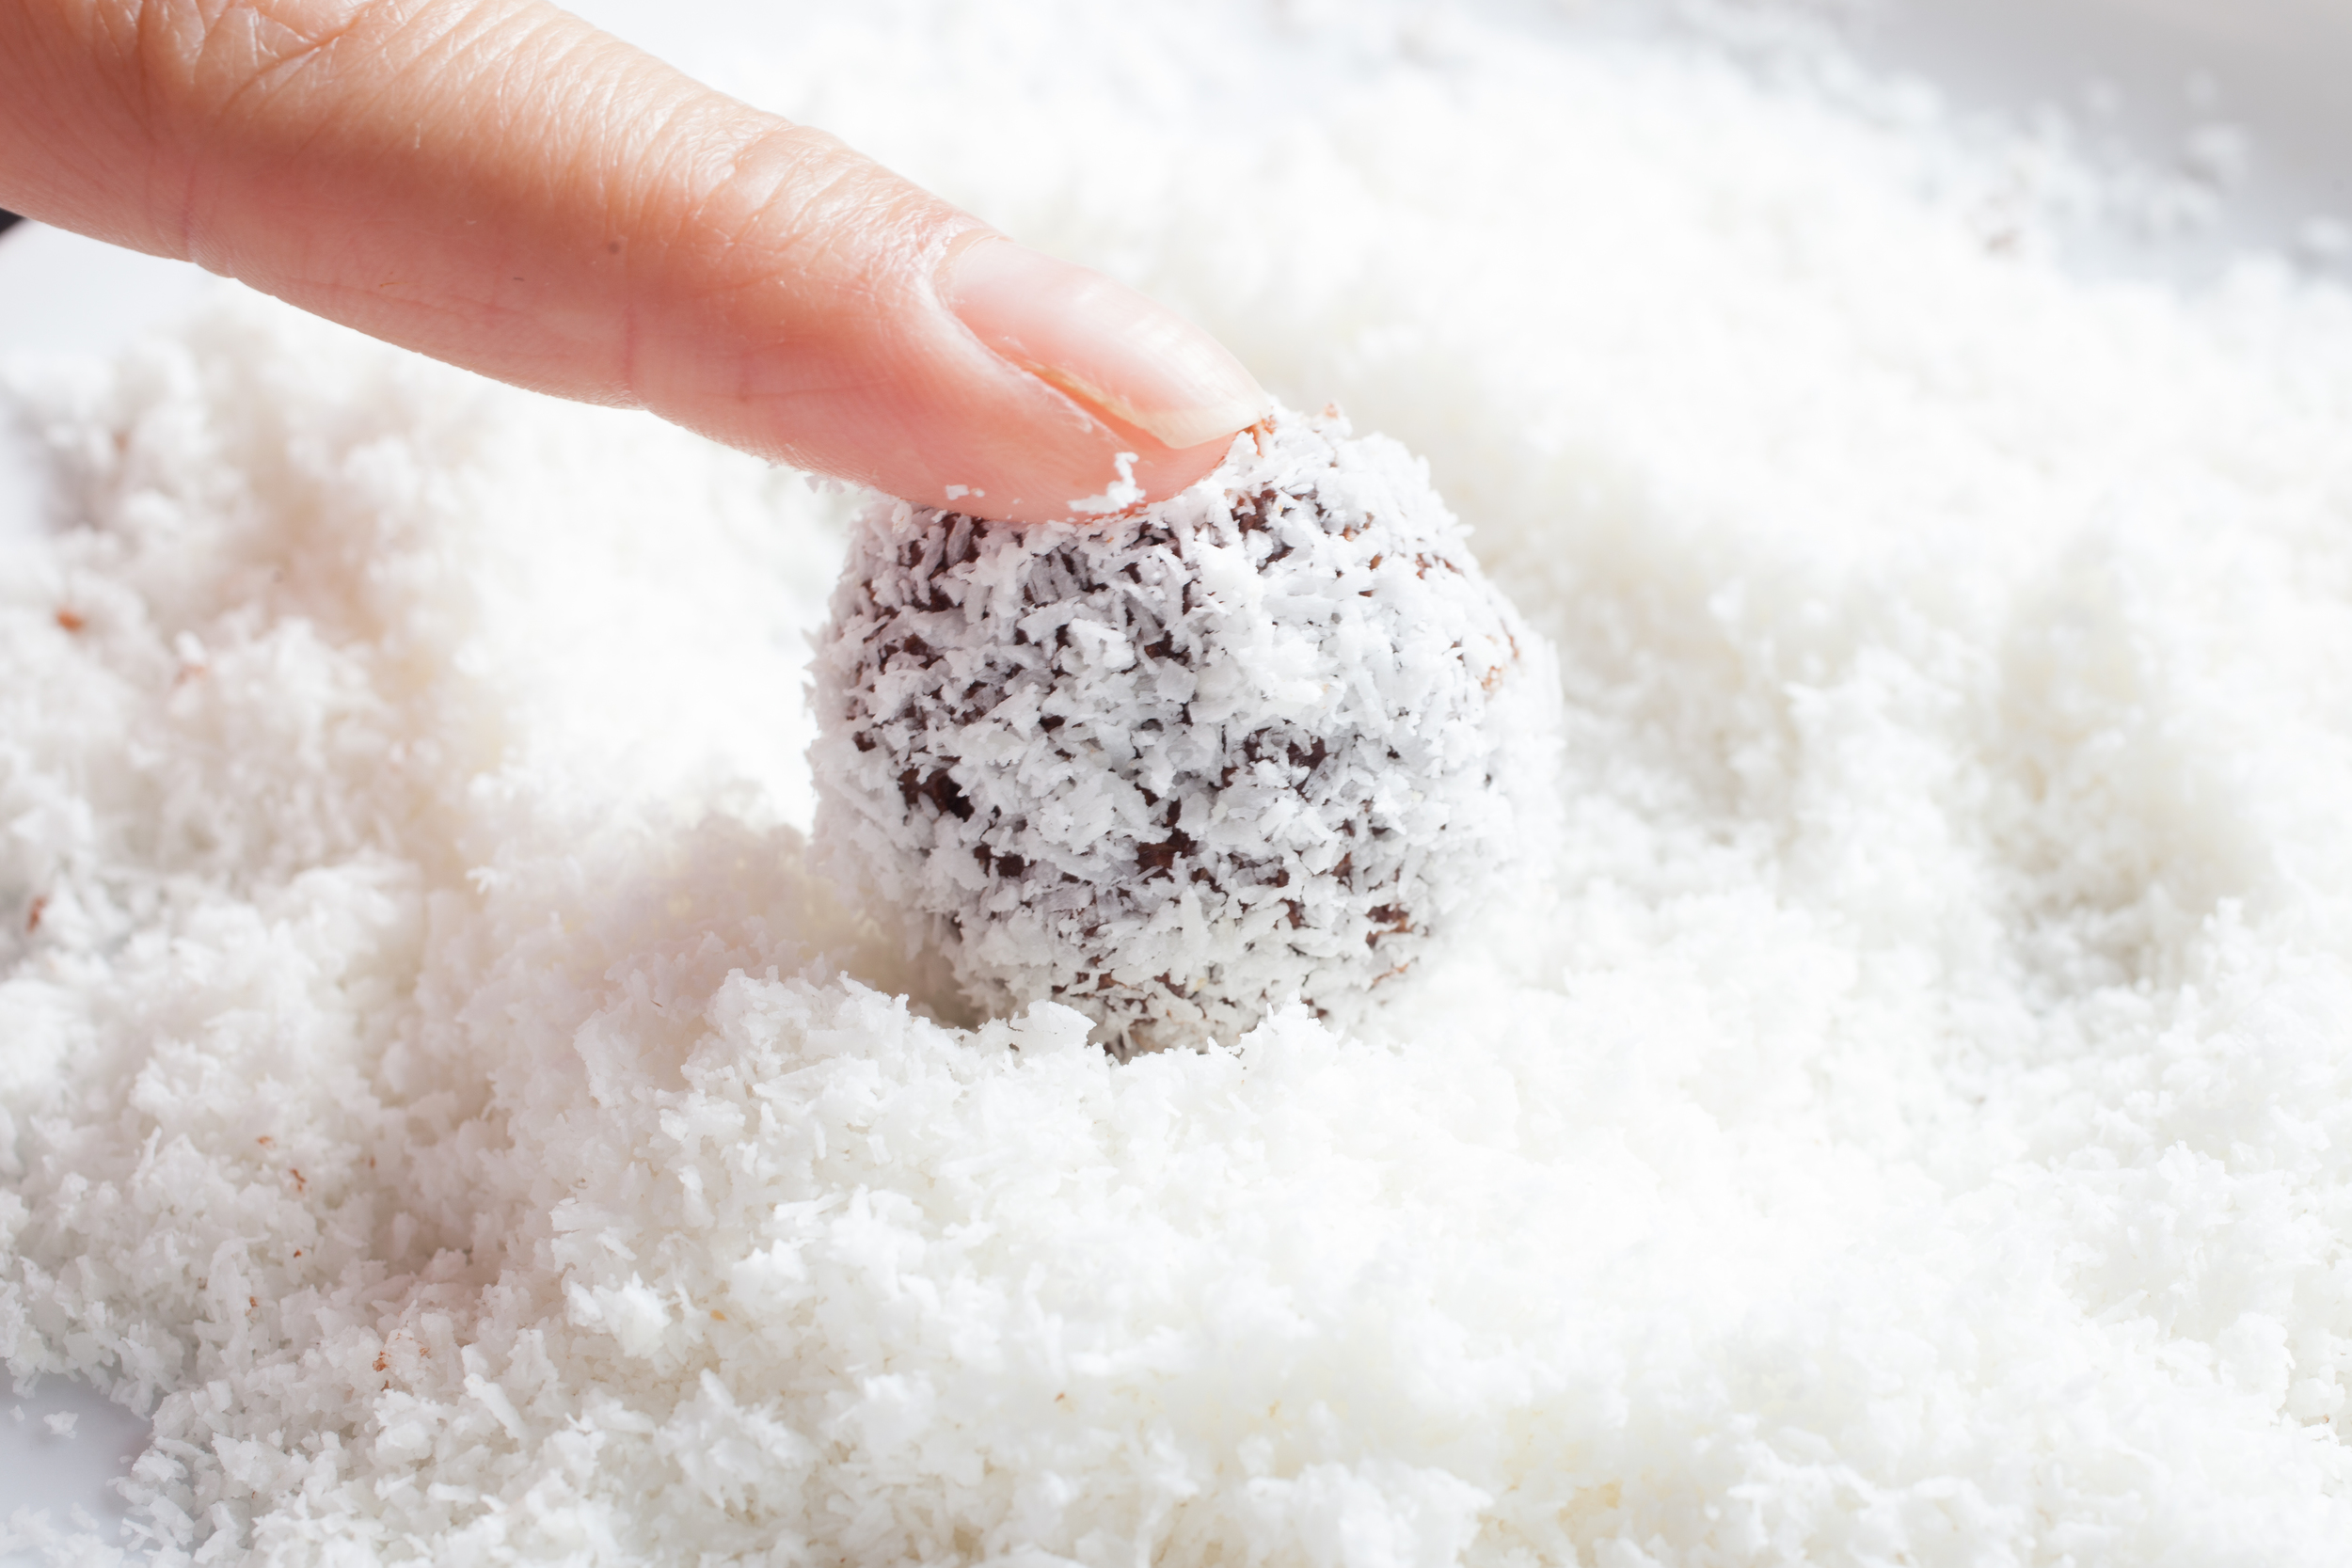 date & roll mademoiselle jules energy ball food recipe mlle